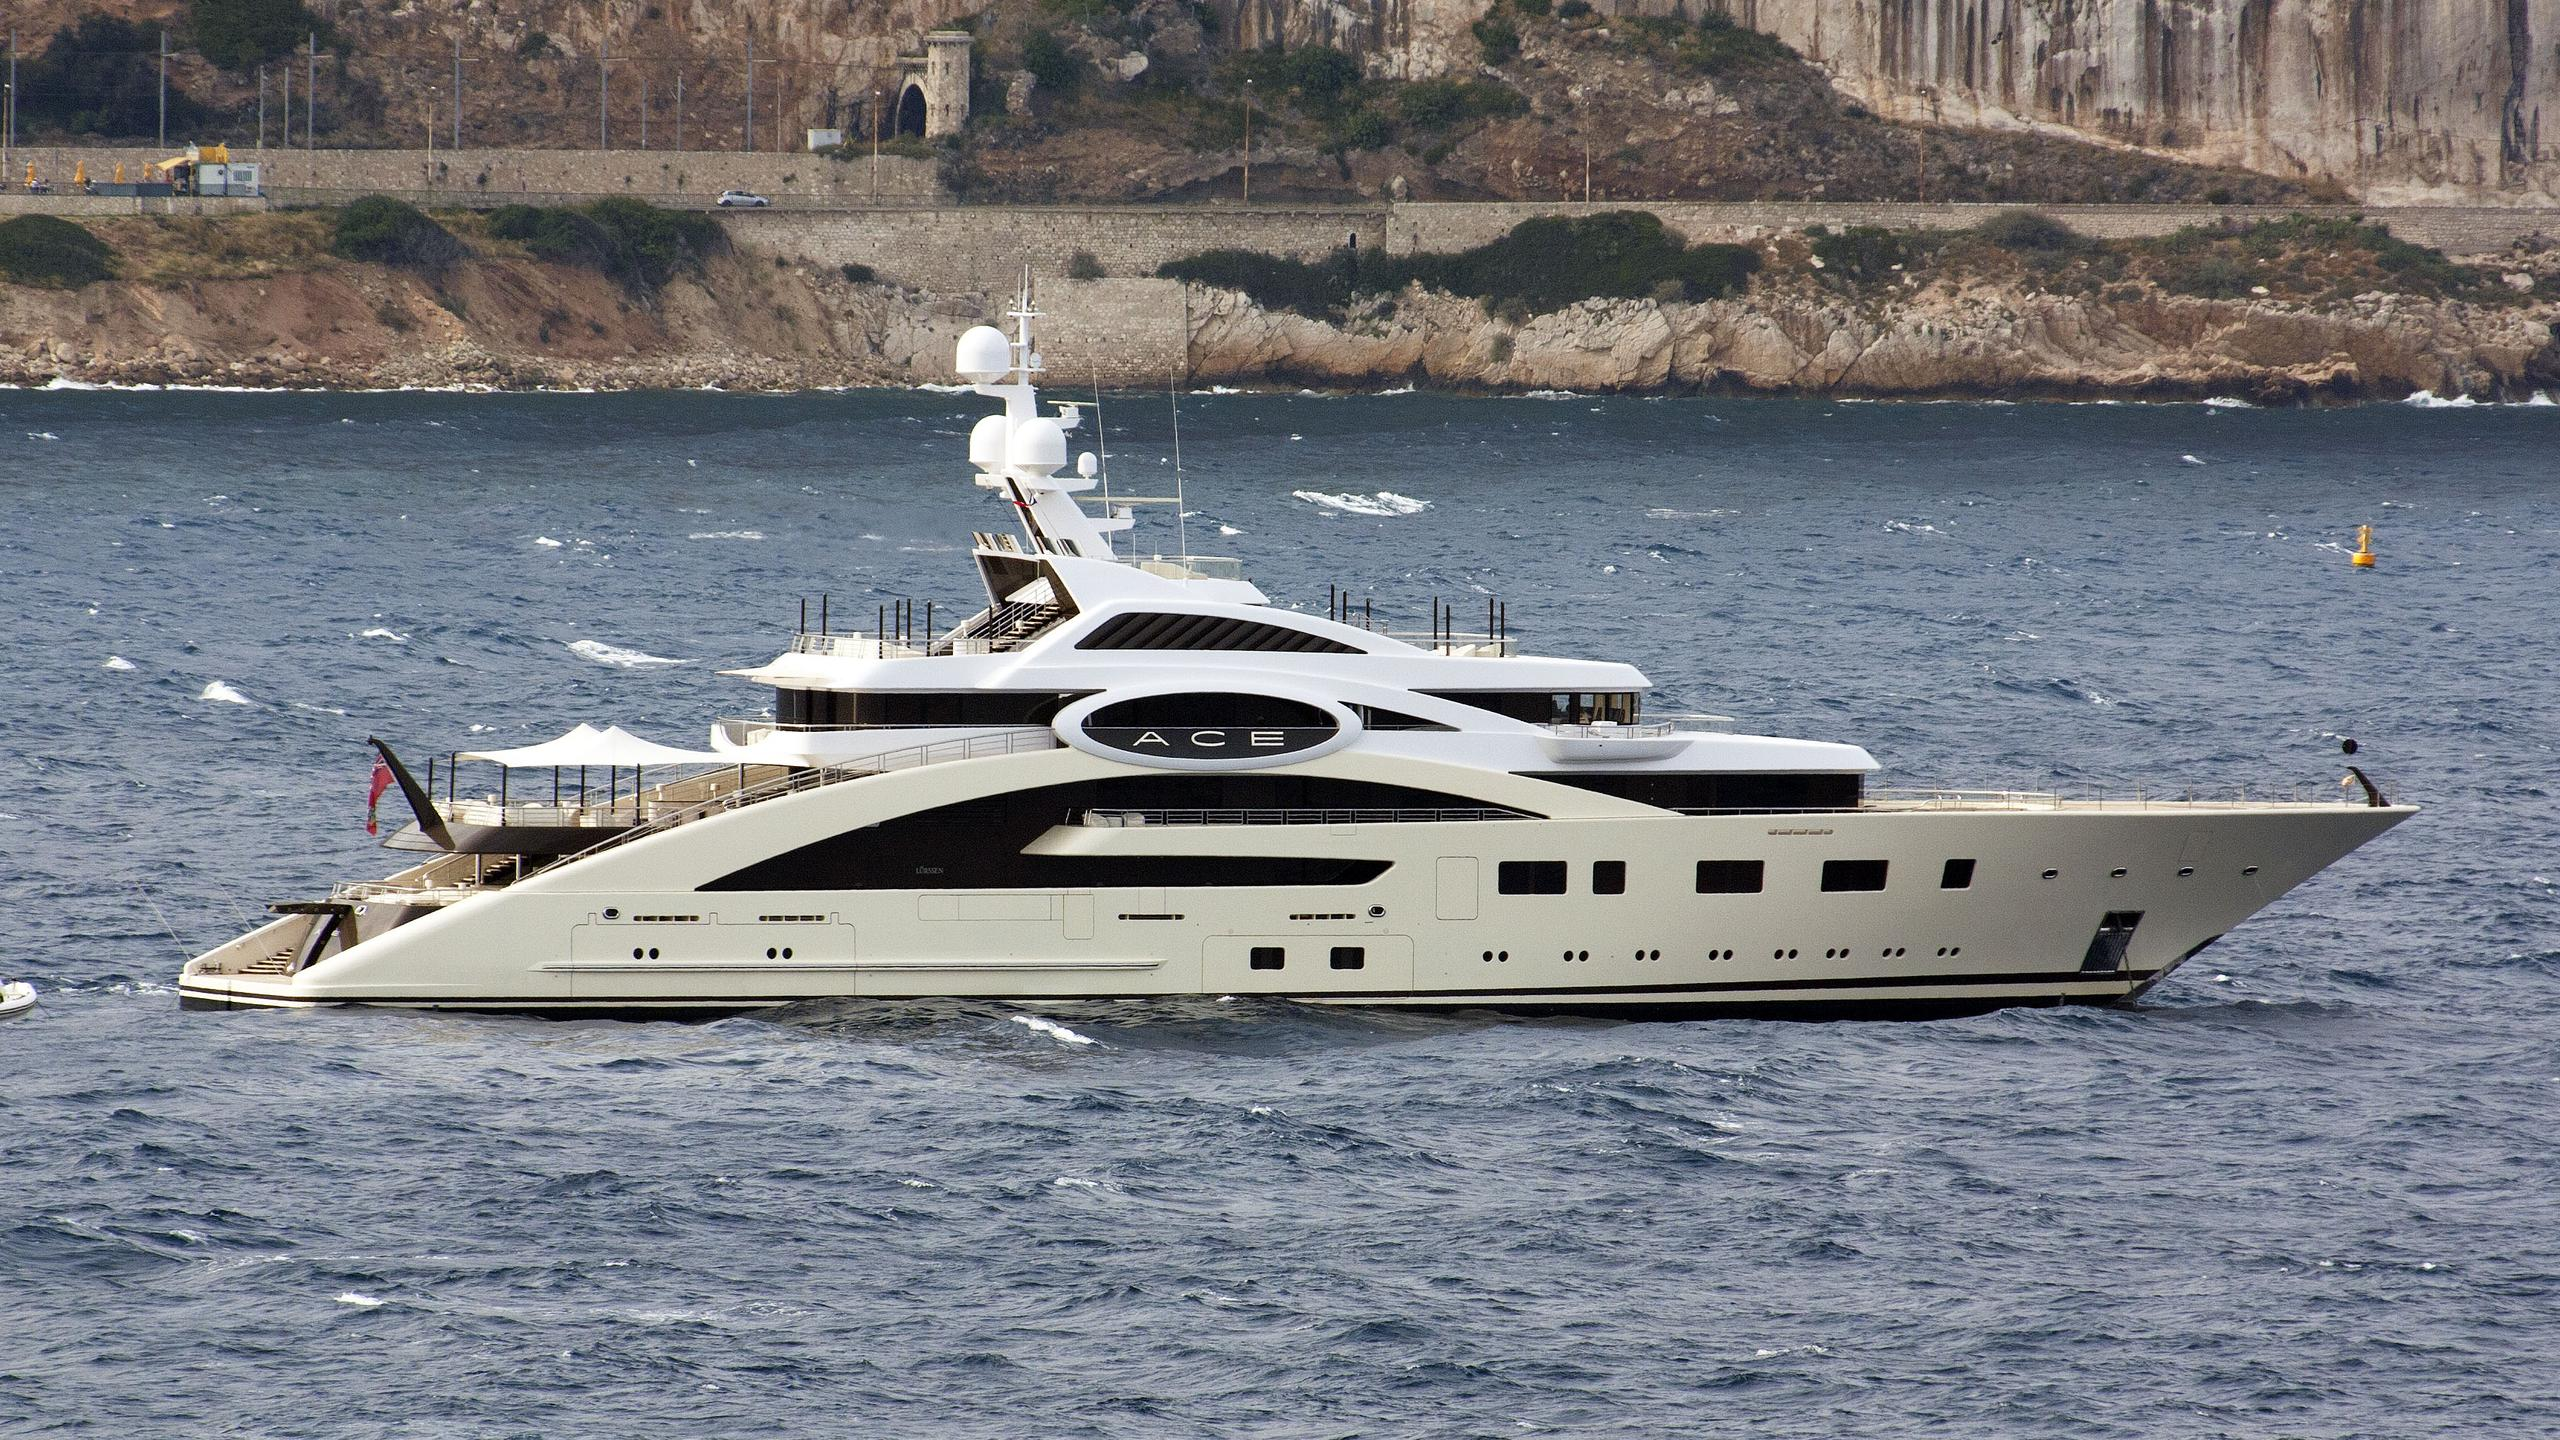 ace-motor-yacht-lurssen-2012-85m-profile